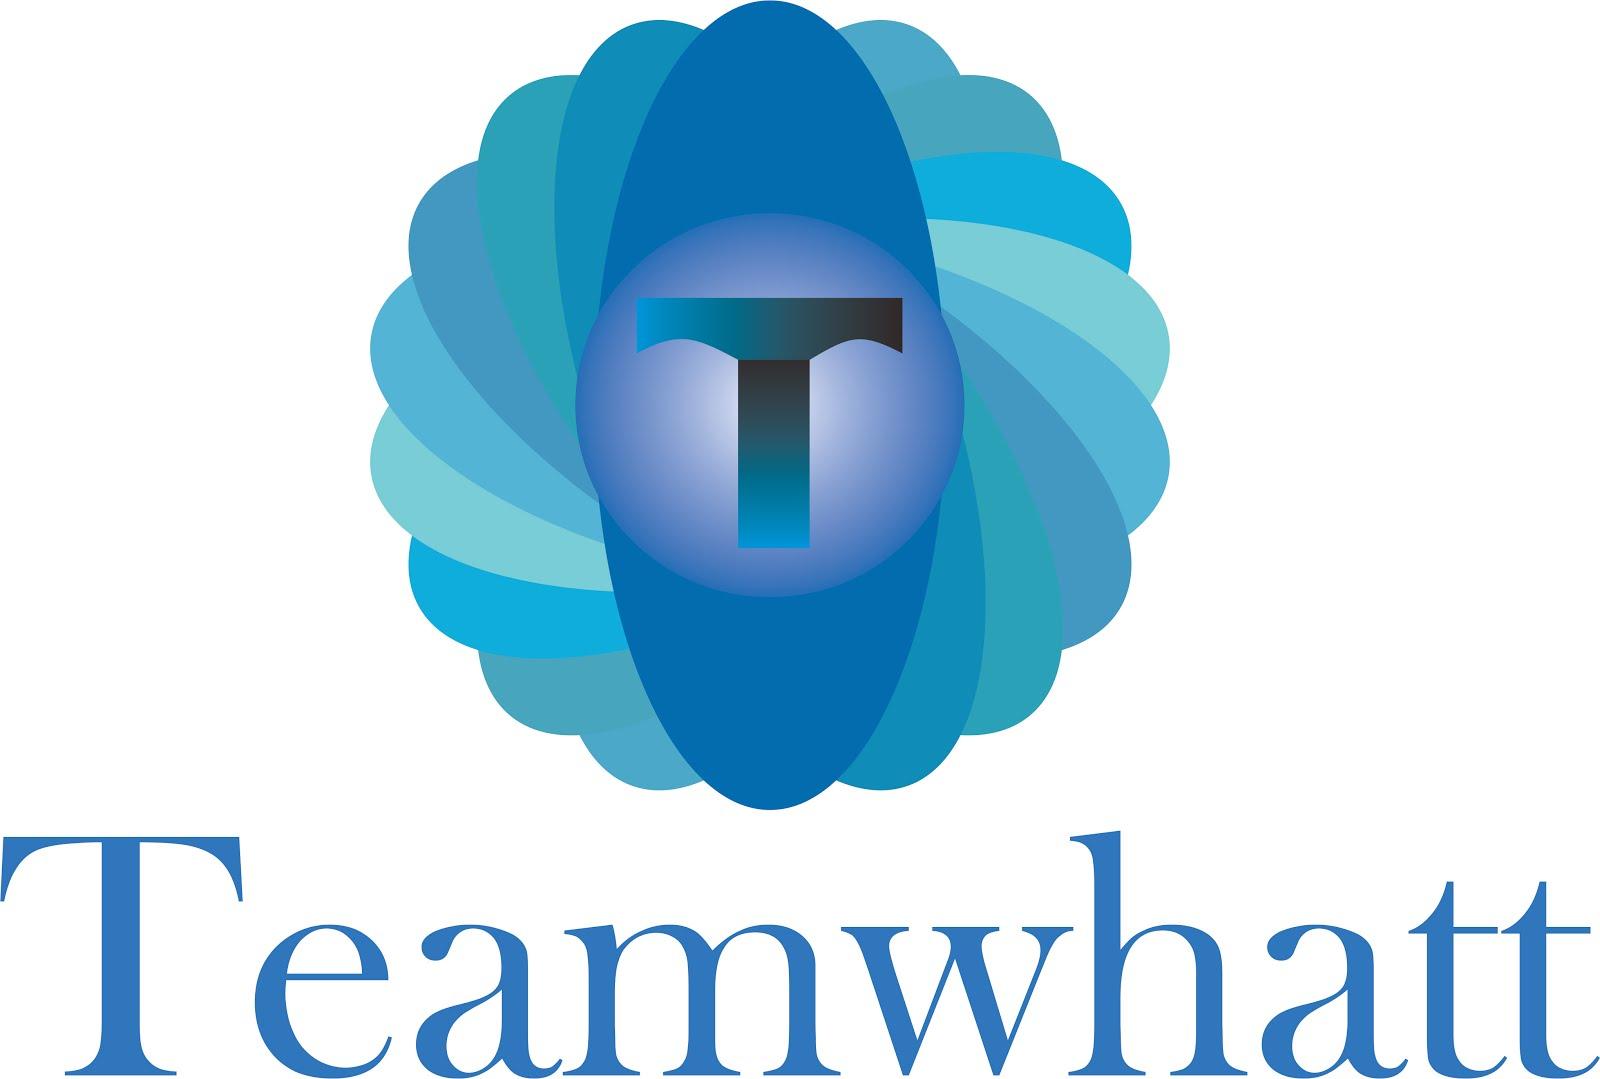 Teamwhatt